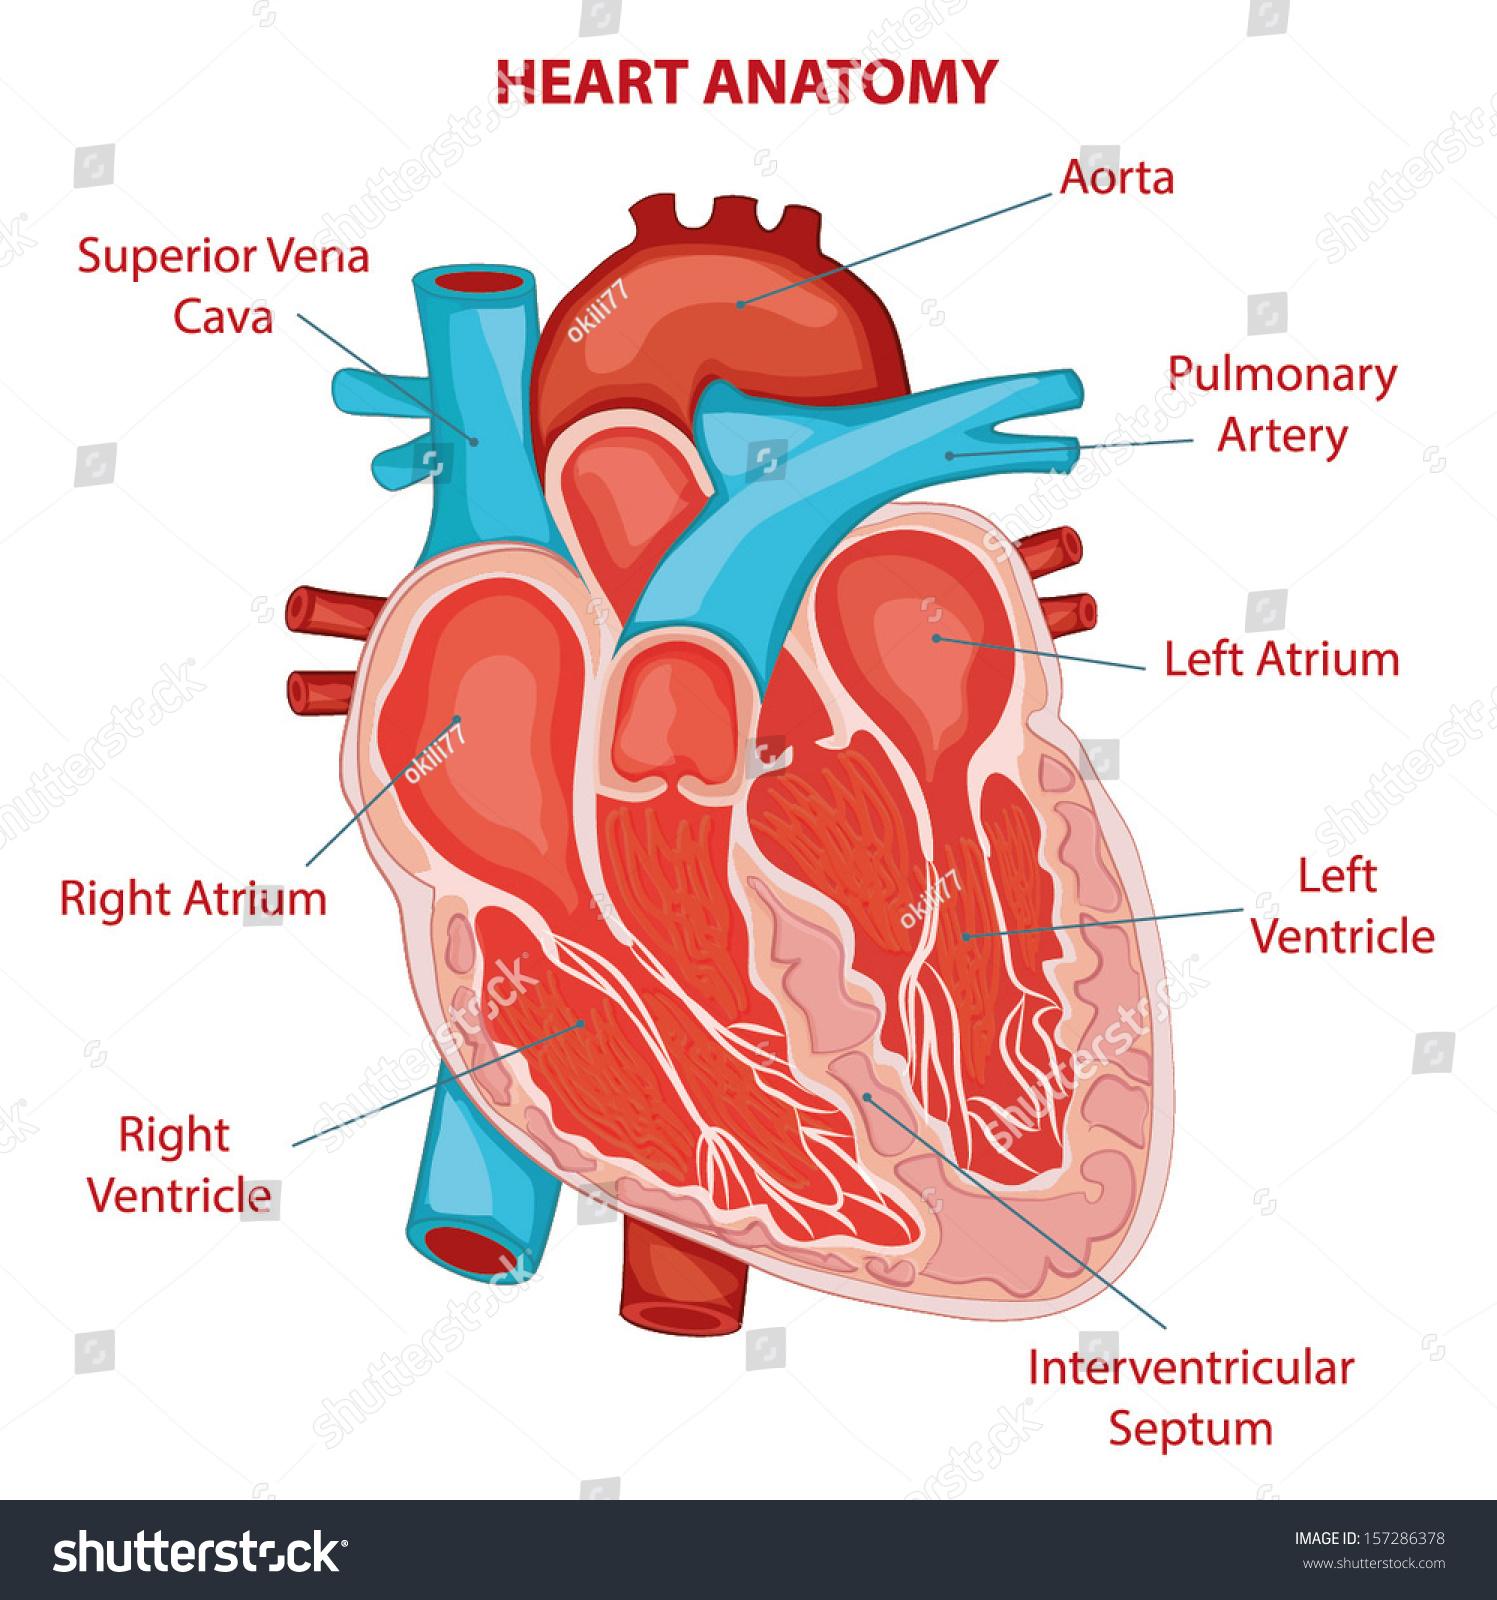 Heart Anatomy Cross Section Diagram Stock Vector